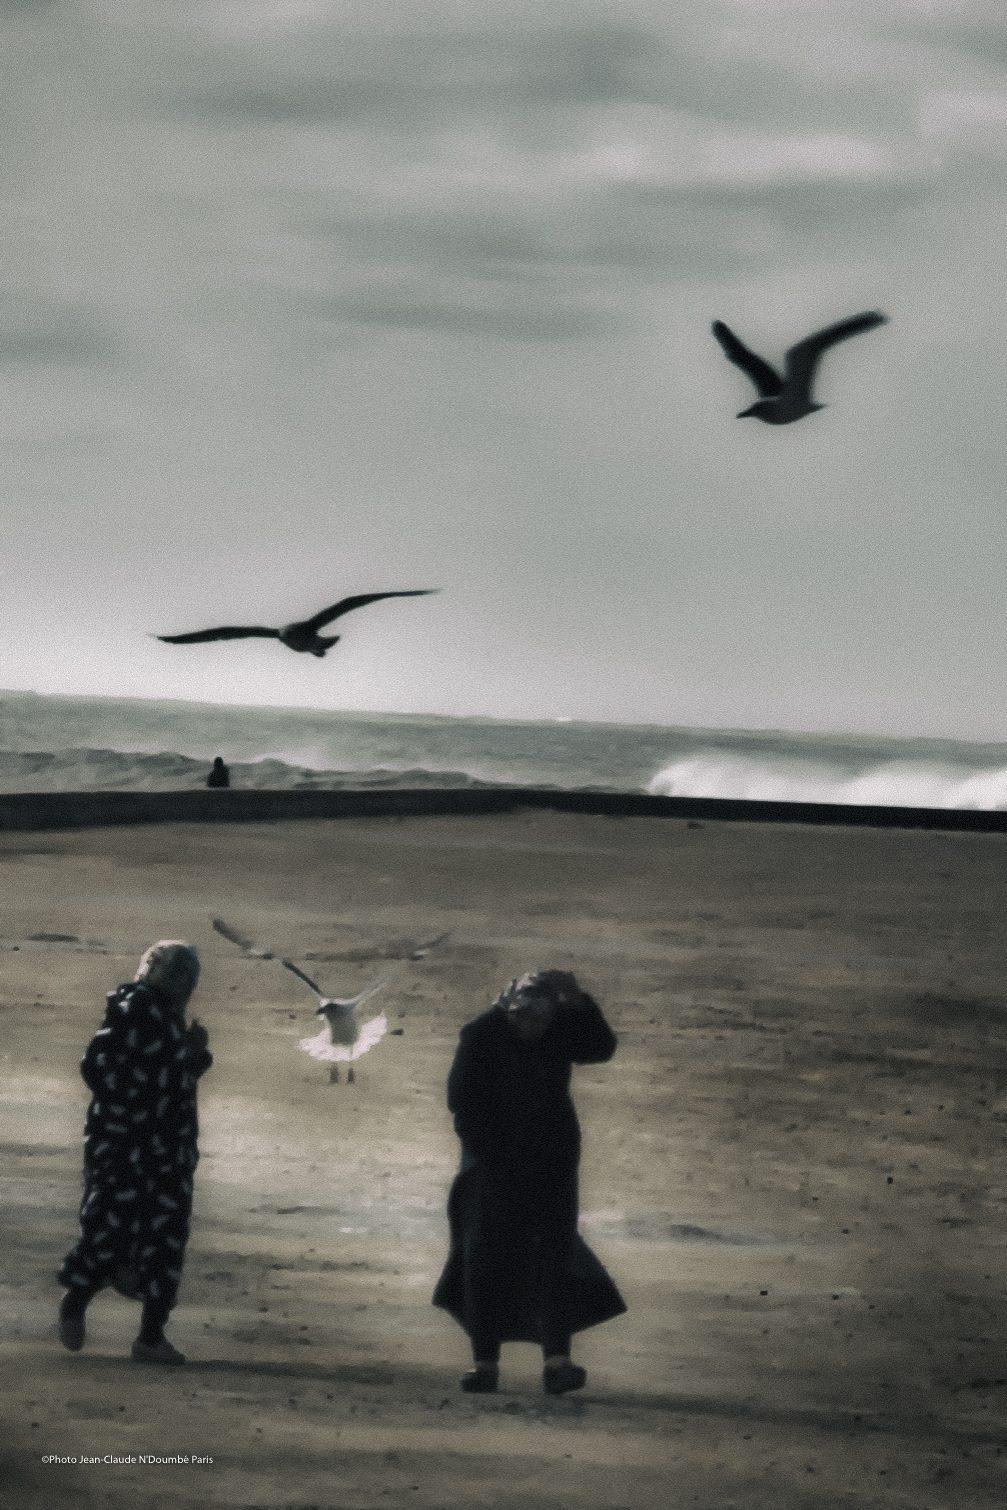 Les Ailes d'Essaouira 2